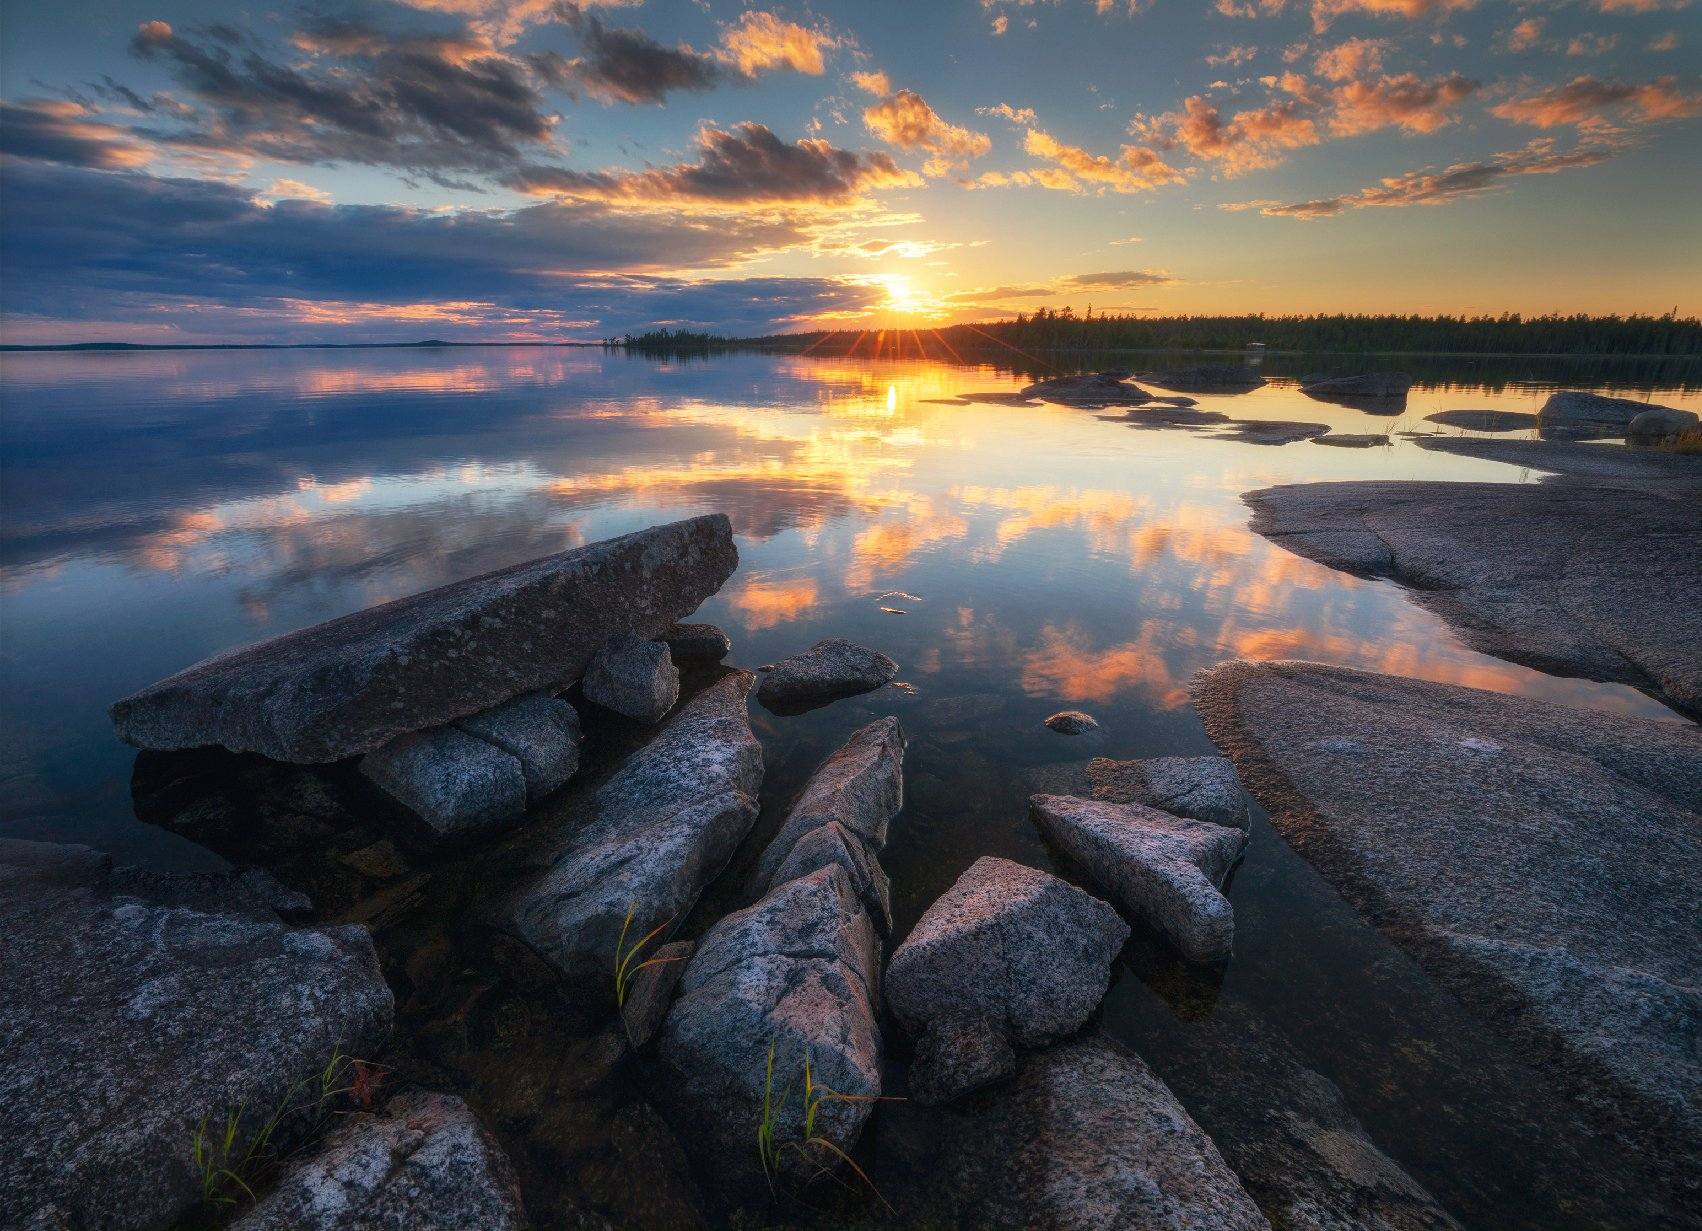 карелия, север, топозеро, закат, Сергей Луканкин